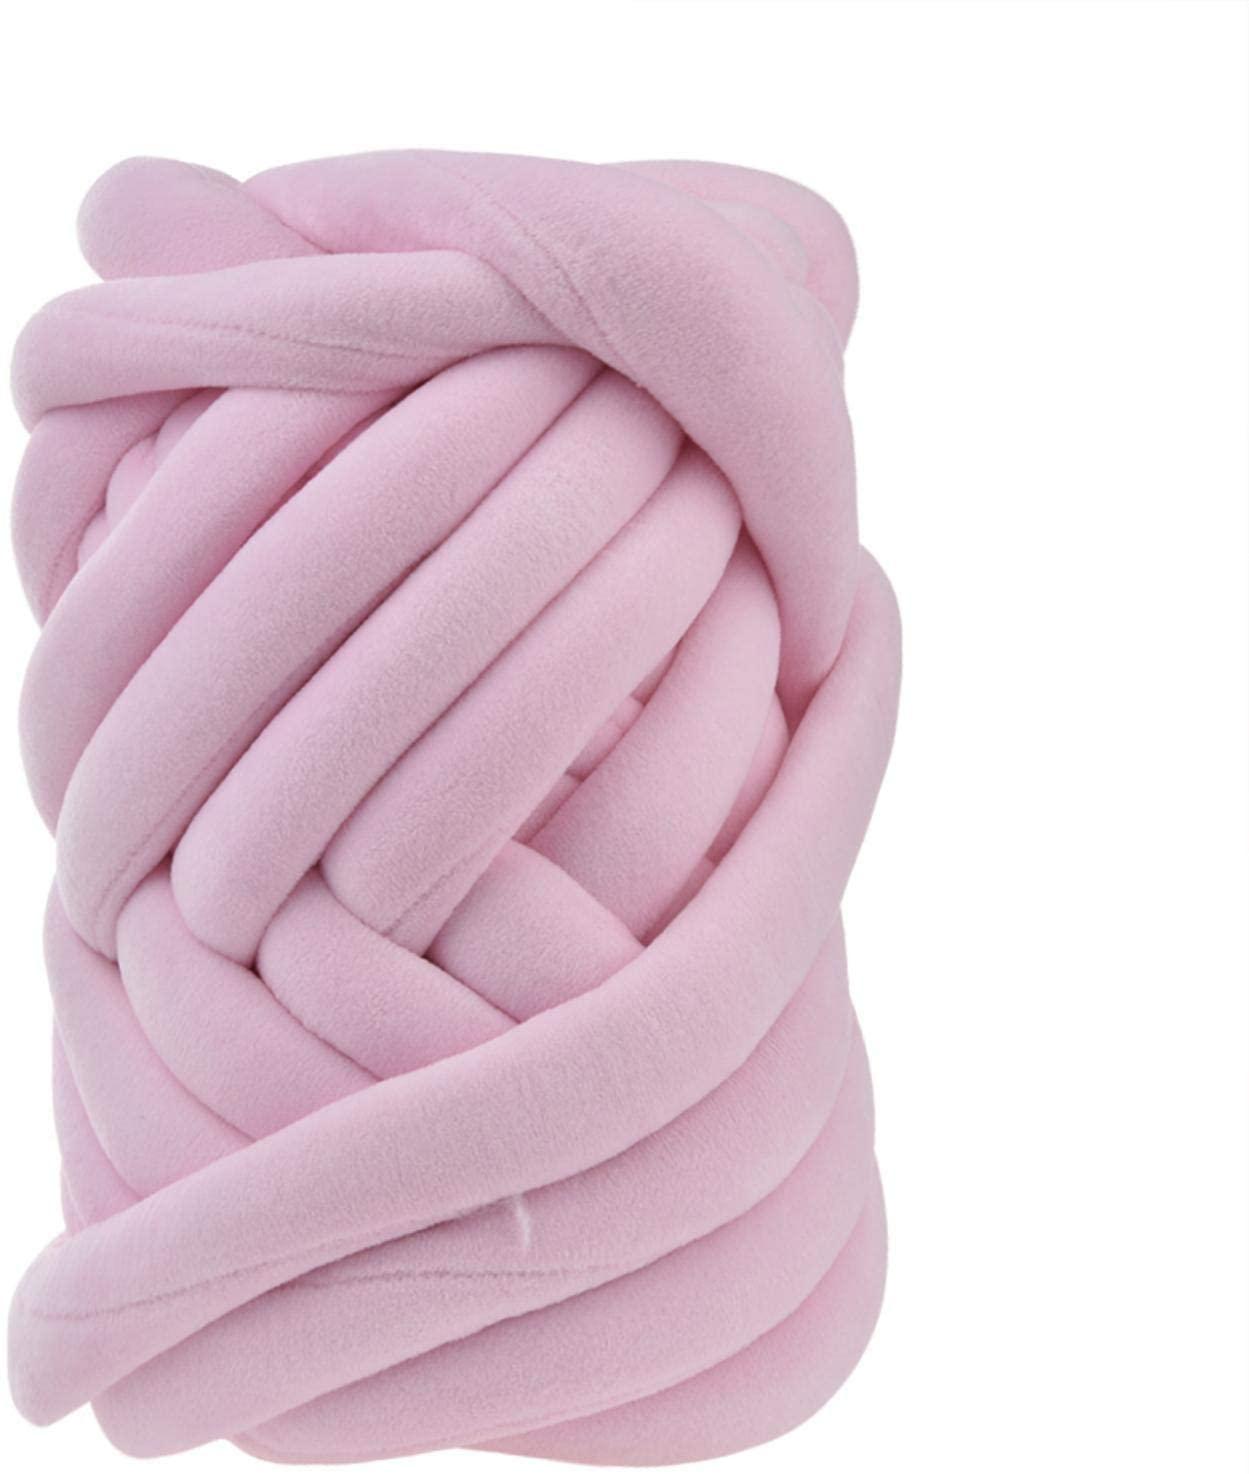 Soft Core Yarn, Multi - Coloured Soft Bulky Arm Knitting Wool Roving, DIY Hand Chunky Bulky Knitting Wool Yarn for Blanket Scarves Hats